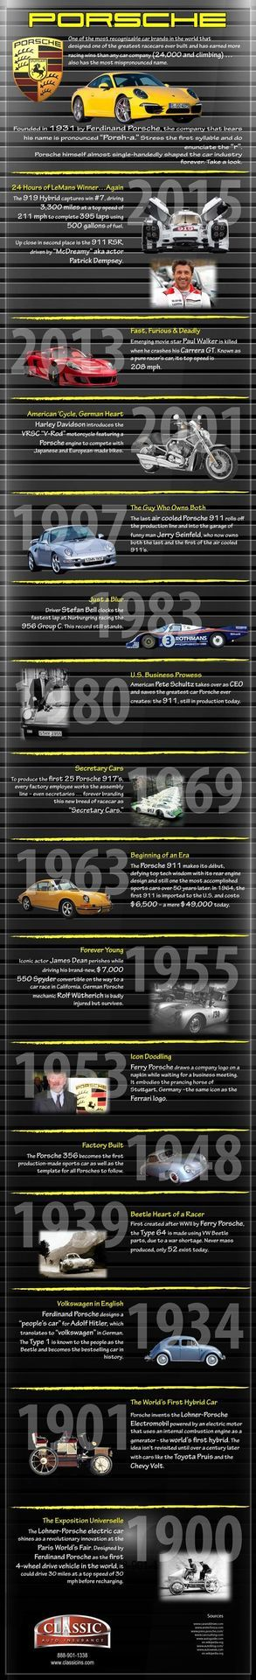 Porsche 50 years infographic